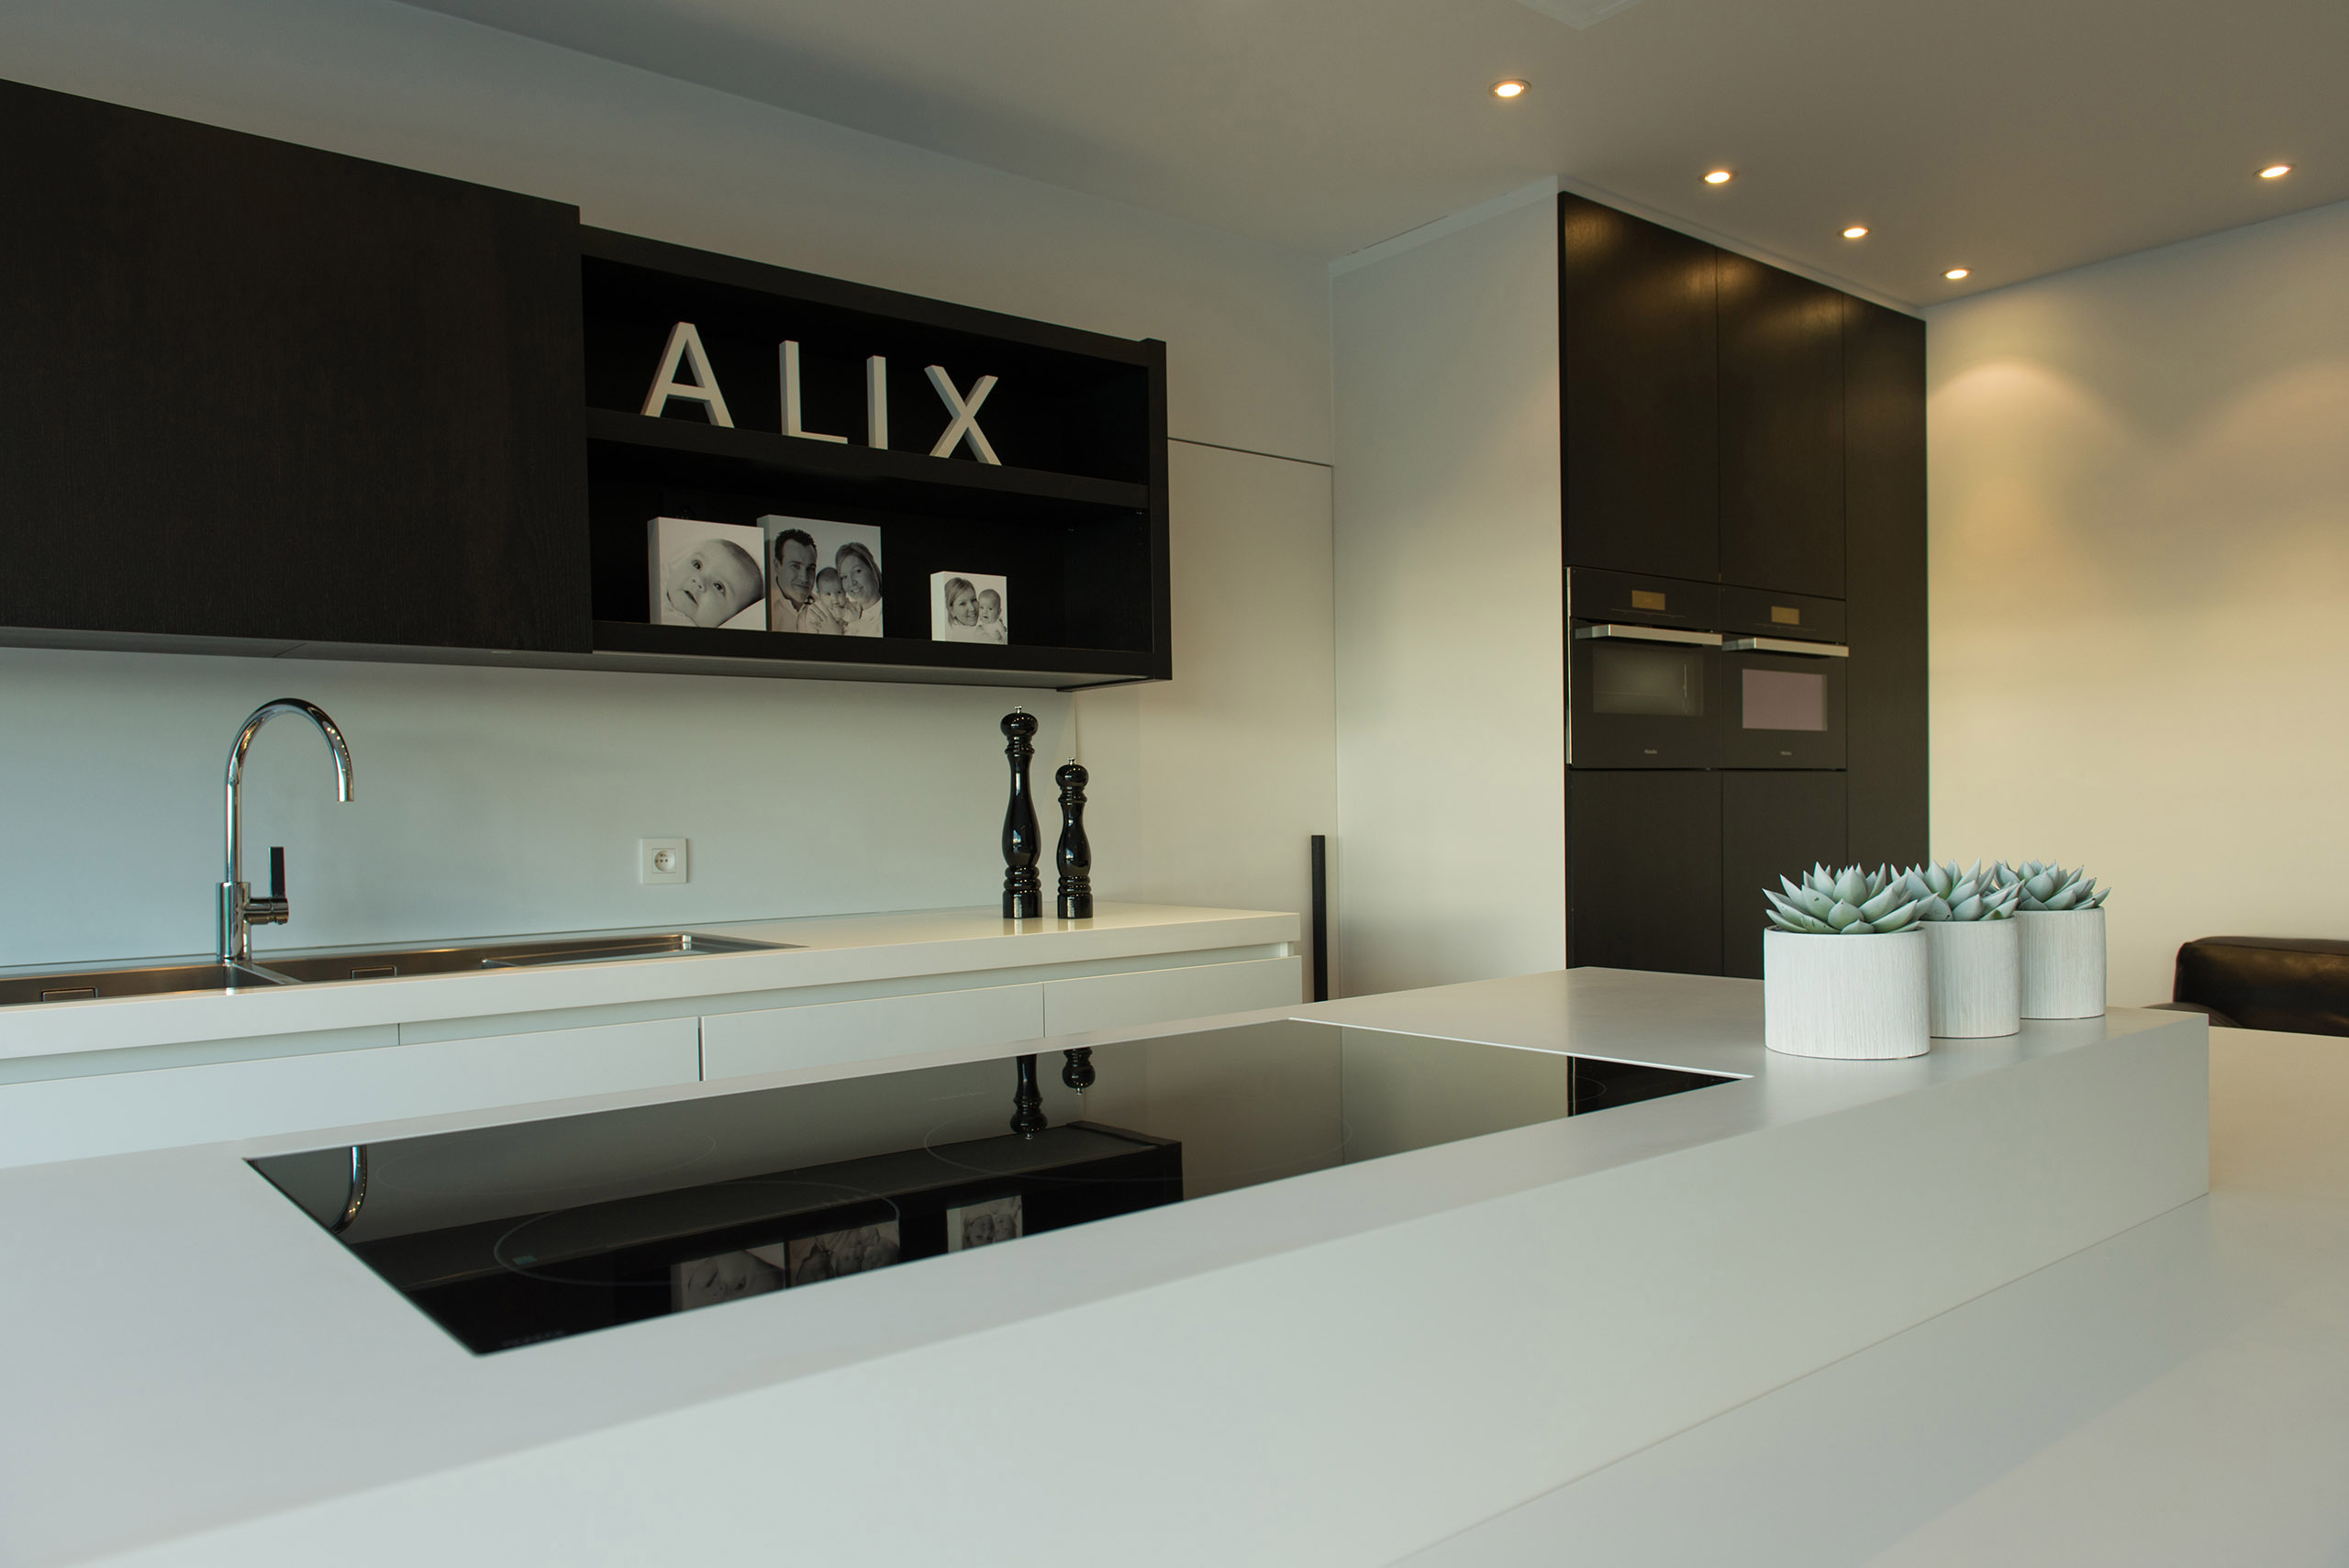 Strakke Witte Keuken In Oisterwijk : Strakke keuken met tablet en ...